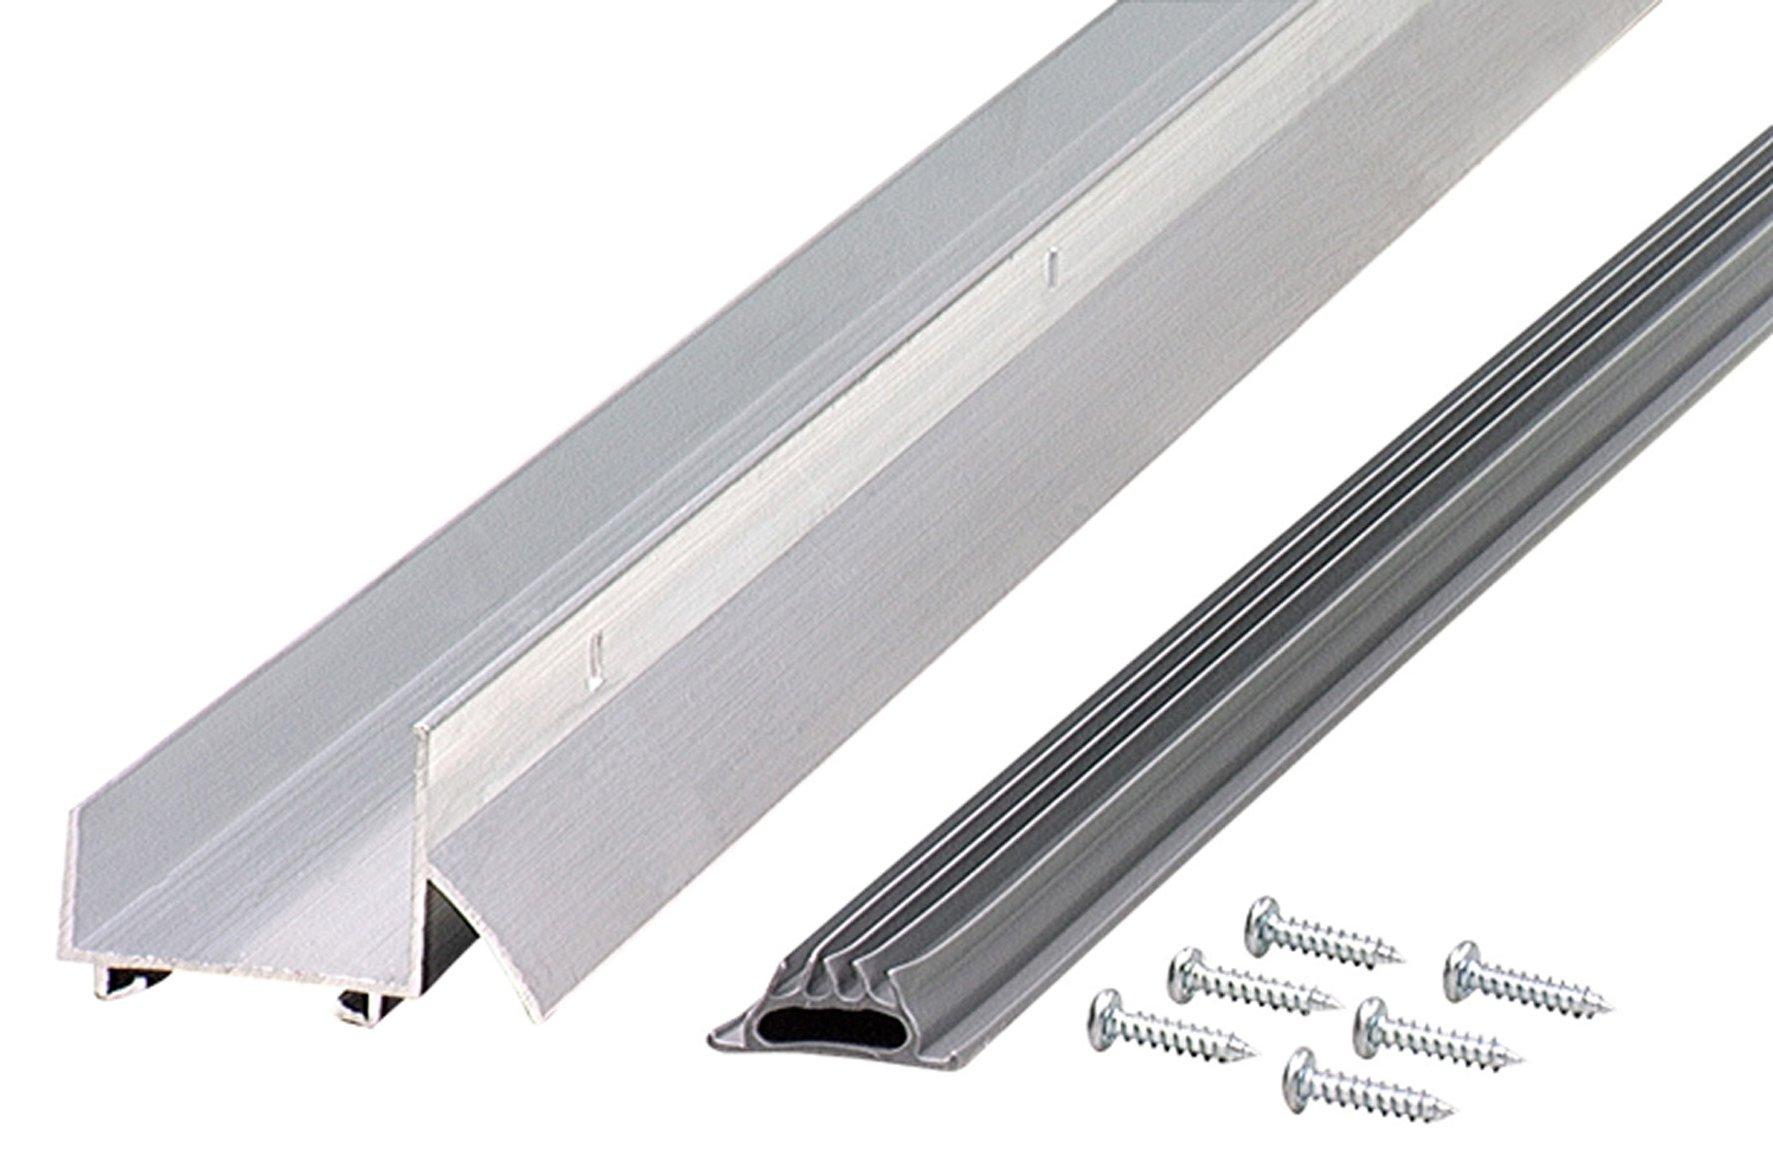 M-D Building Products 6114 36-Inch Fits 1-3/8 Inch Doors U-Shaped Door Bottom with Drip Cap